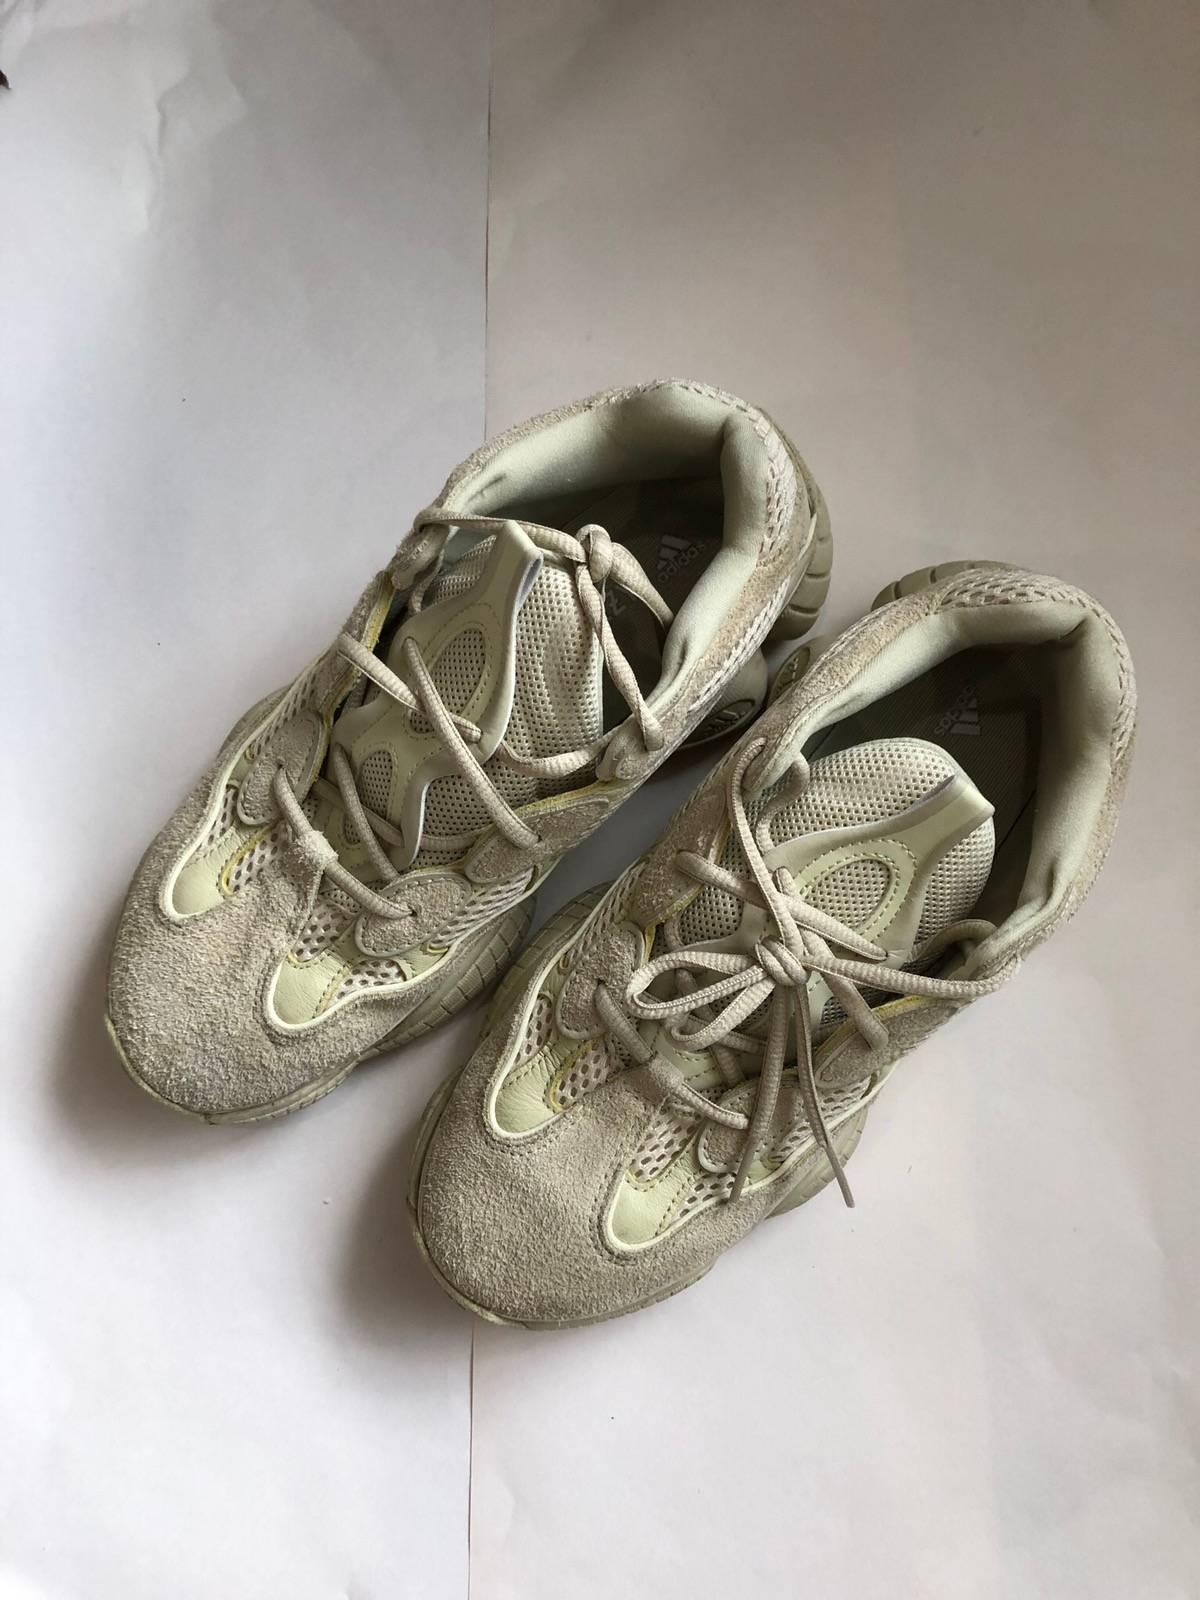 adc42e068 Adidas × Adidas Kanye West × Yeezy Boost ×. Adidas x Yeezy 500 SuperMoon  Yellow